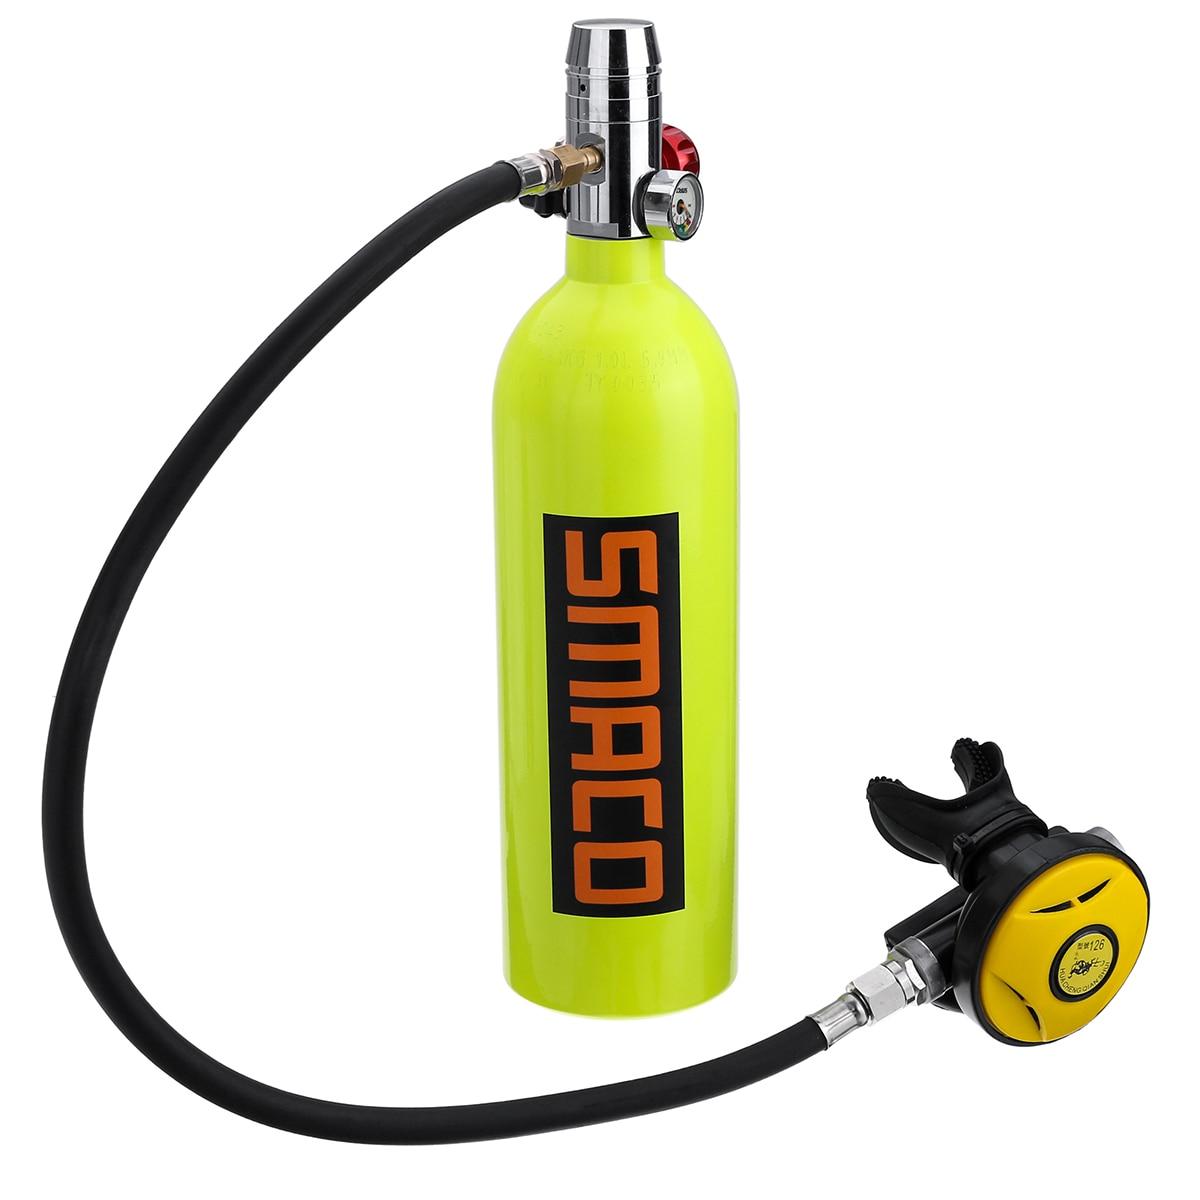 1L Scuba Oxygen Cylinder Diving Air Tank Scuba Regulator Diving Respirator Snorkeling Breathing Equipment Green Orange Black